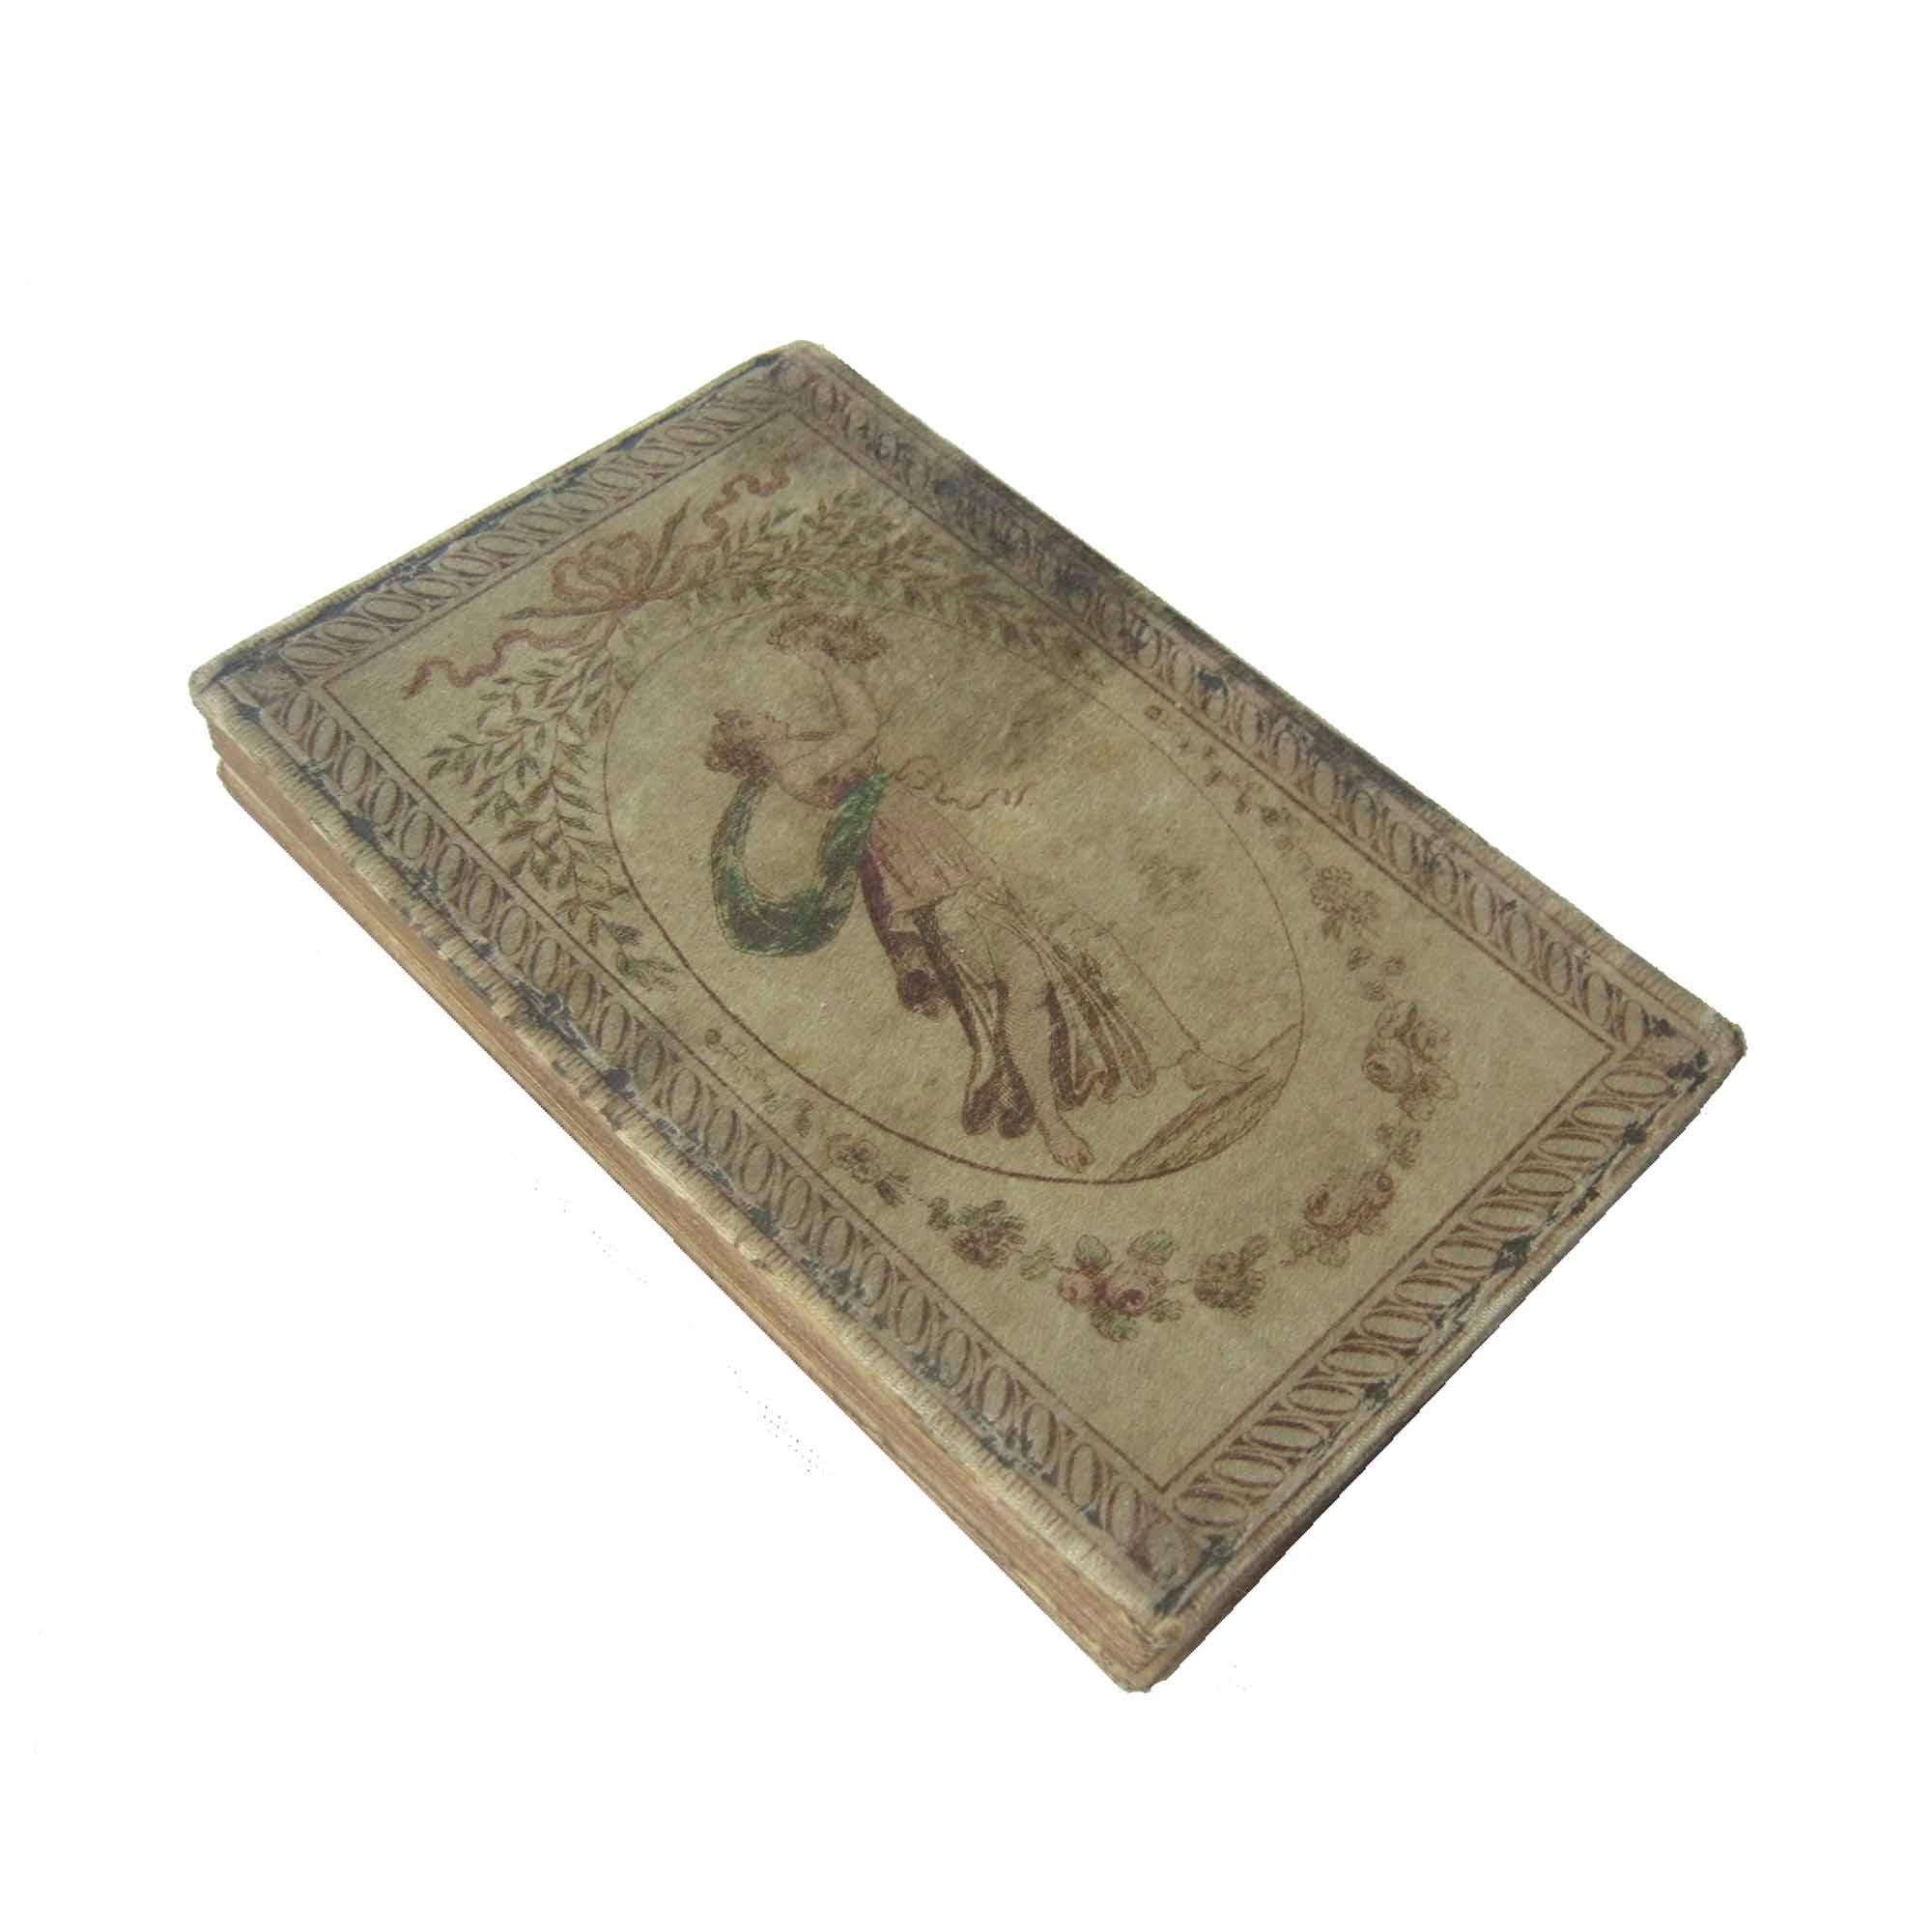 5476-Almanac-Vienne-1804-Einband-frei-N.jpg